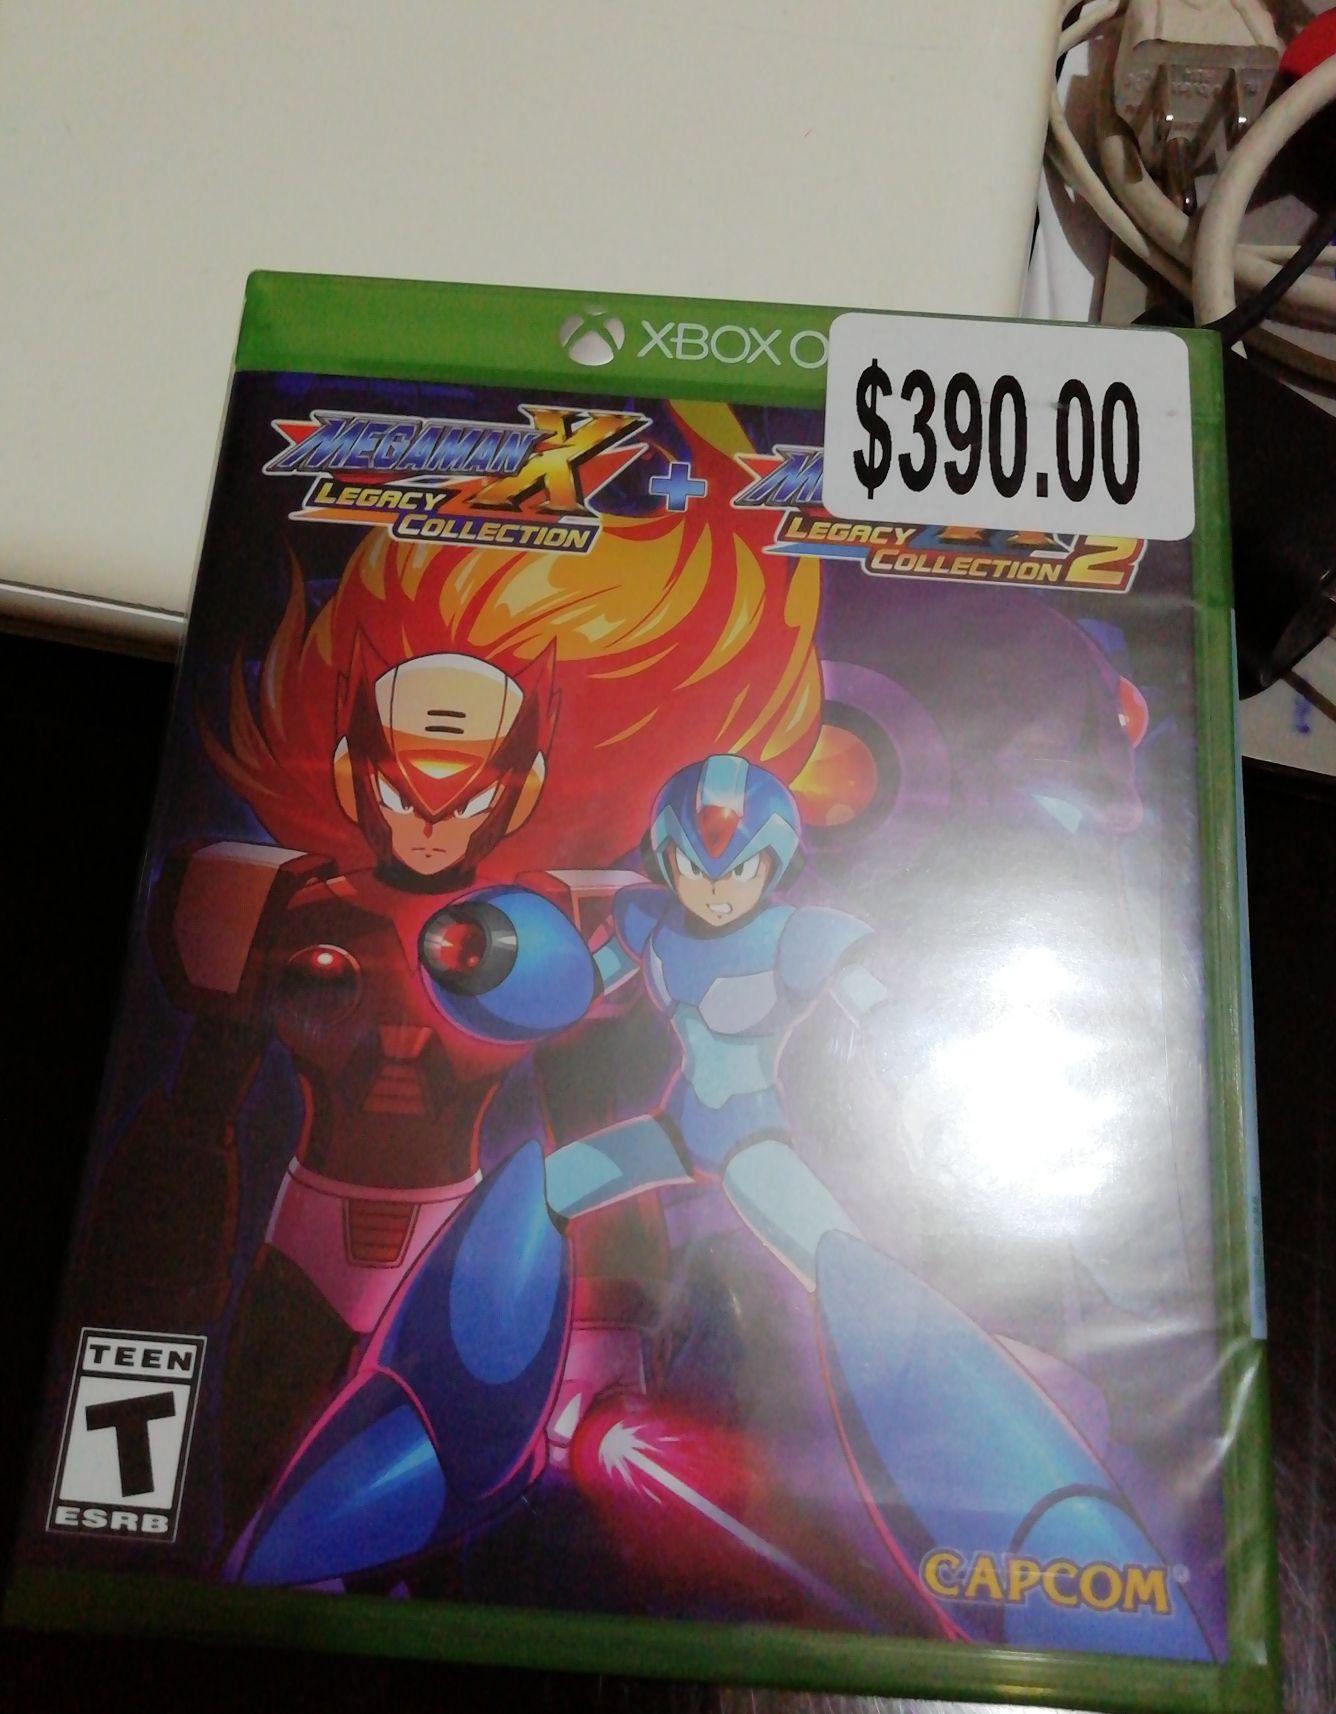 Bodega Aurrera: Megaman X Legacy Colection 1 y 2